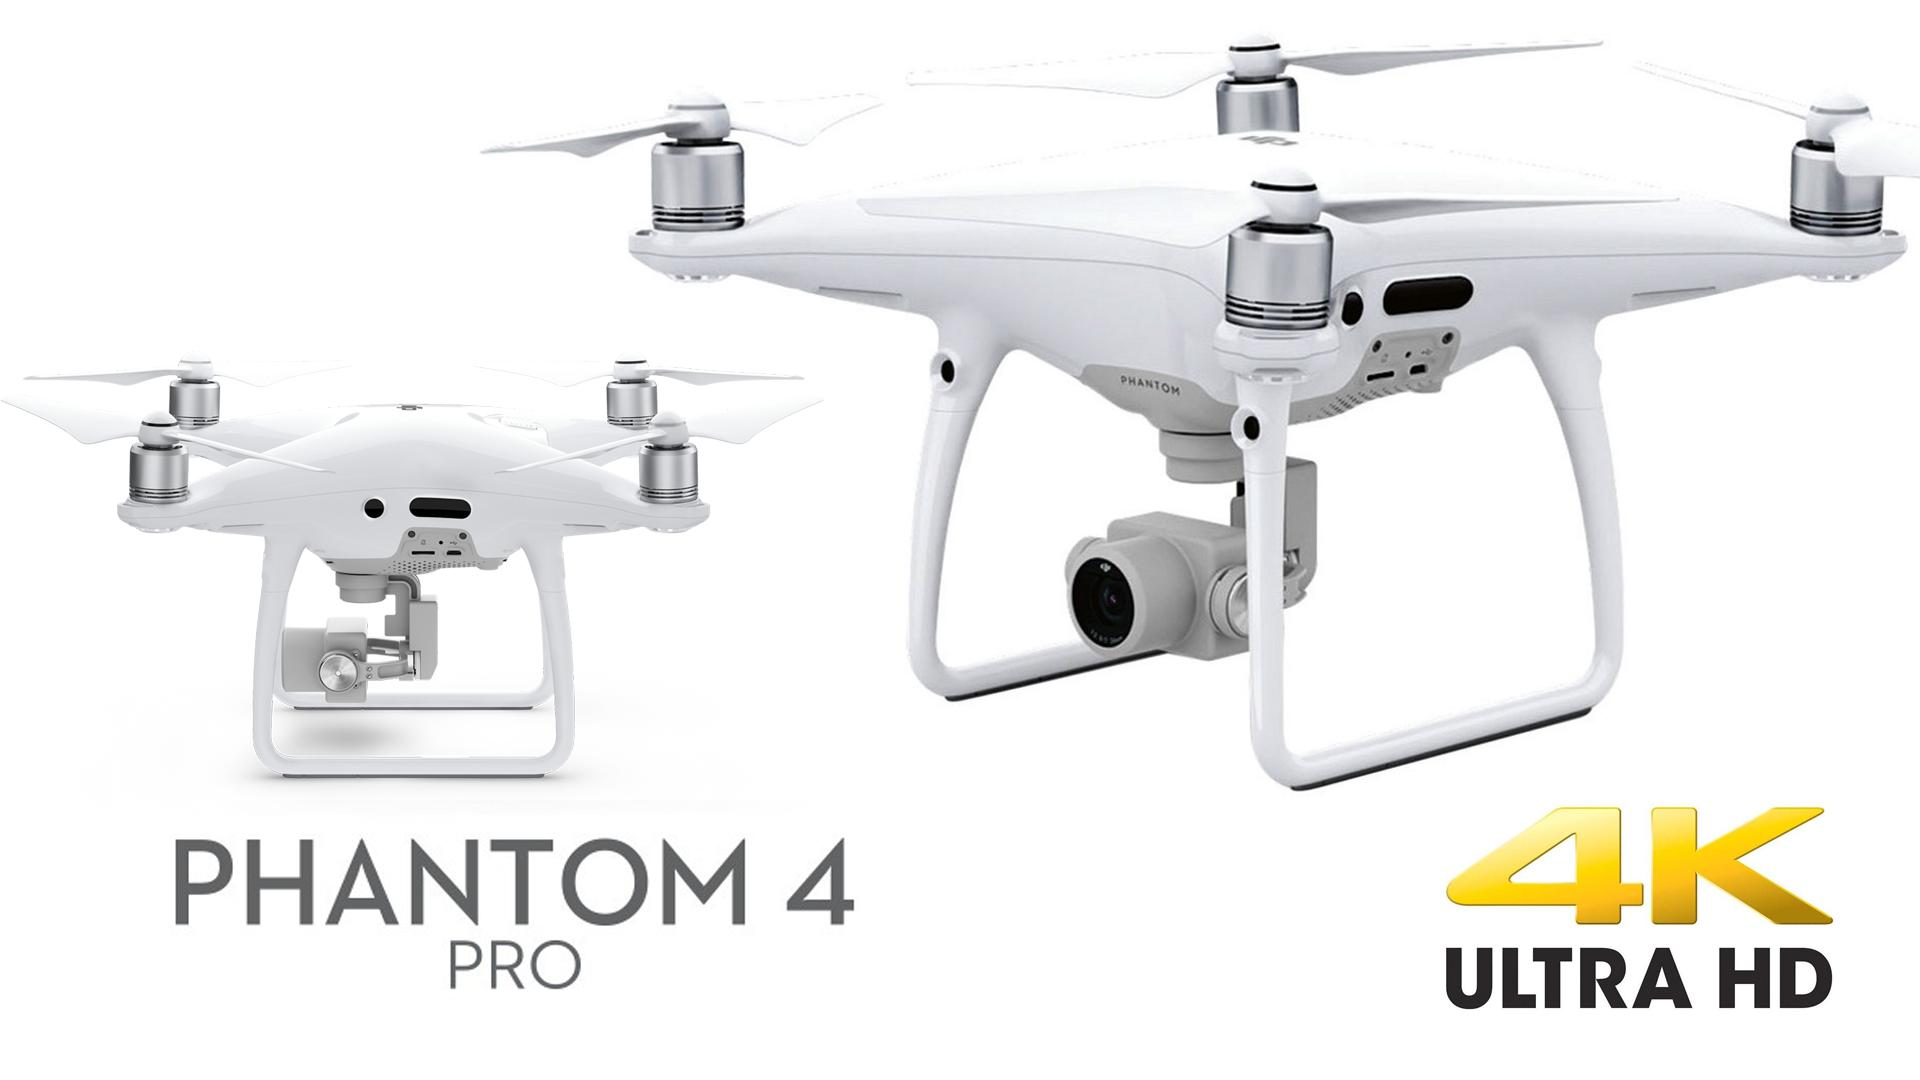 DRON DJI PHANTOM 4 PRO (pagina web)